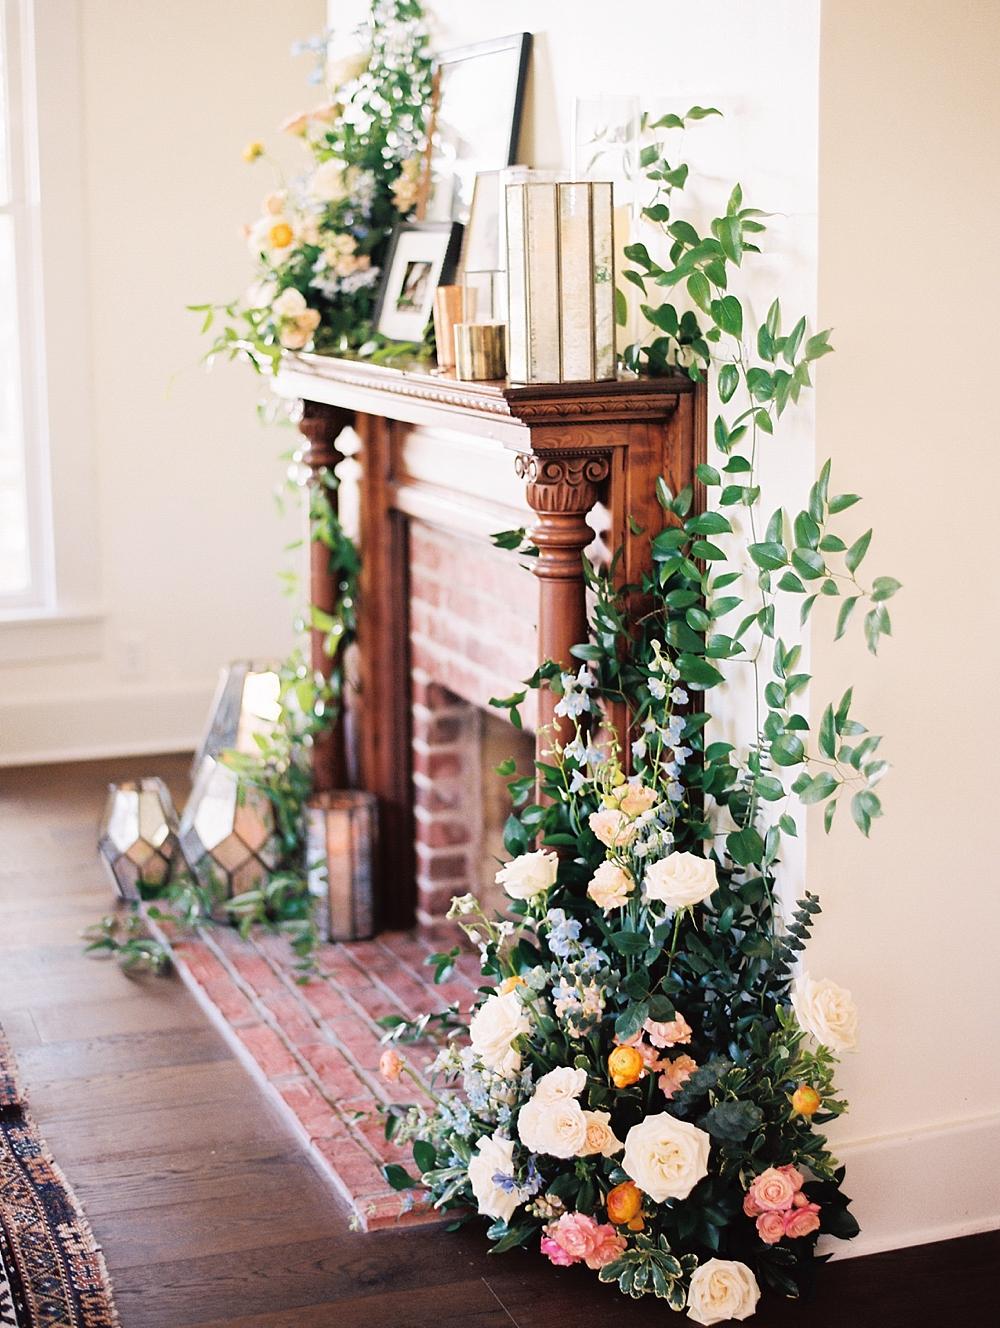 Kristin-La-Voie-Photography-Austin-Wedding-Photographer-the-grand-lady-4